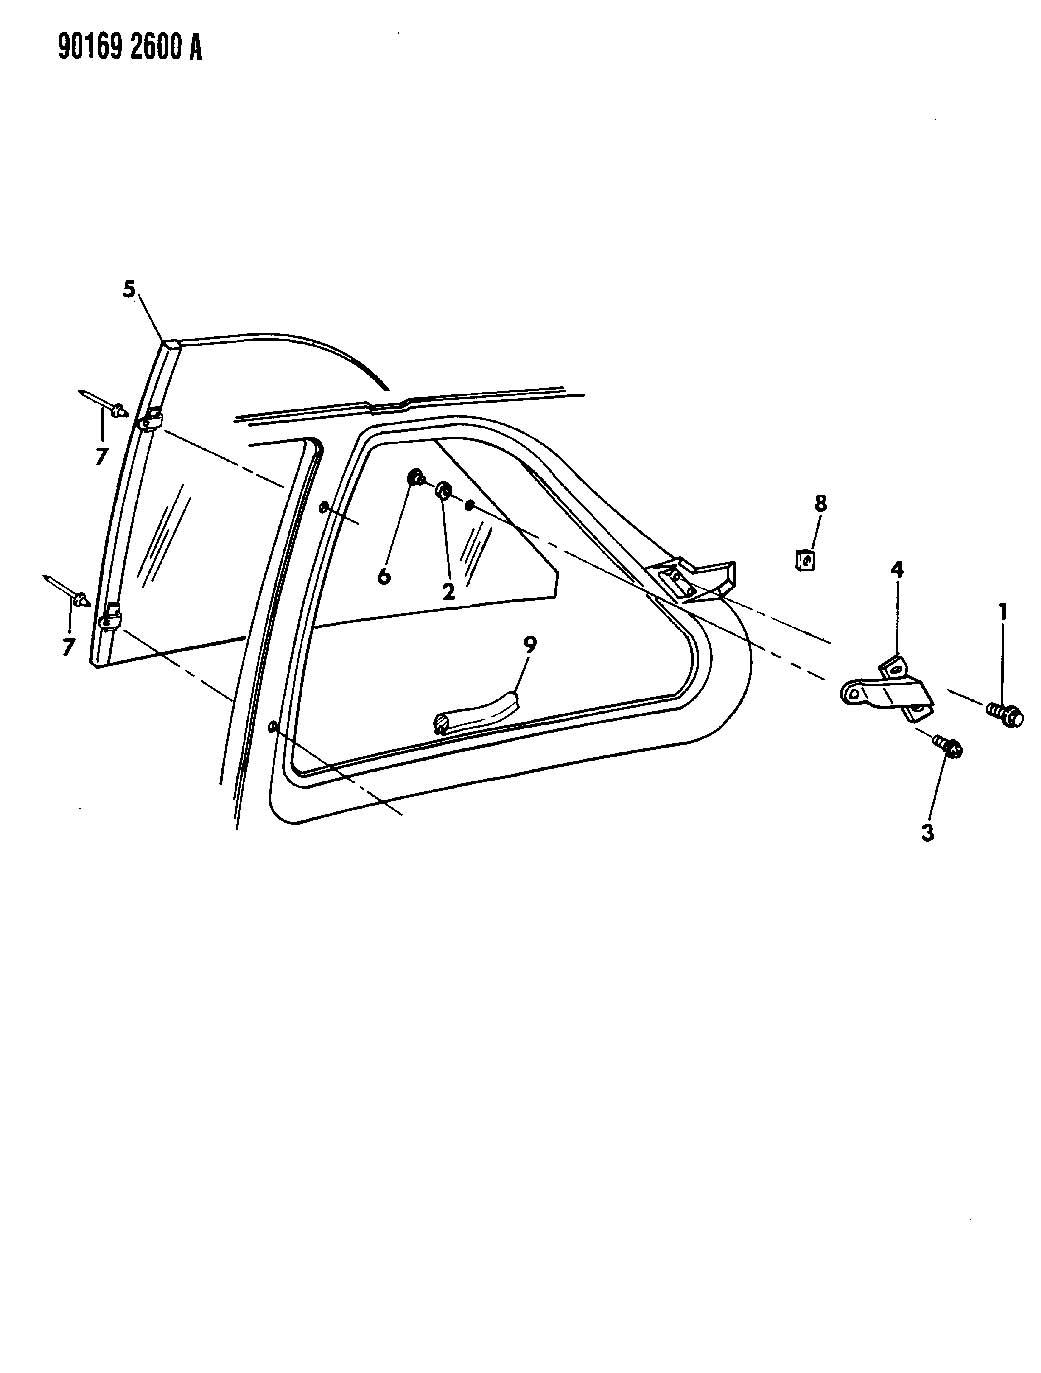 Dodge Caravan Rivet. 25x.110/.189. Used for: upper and